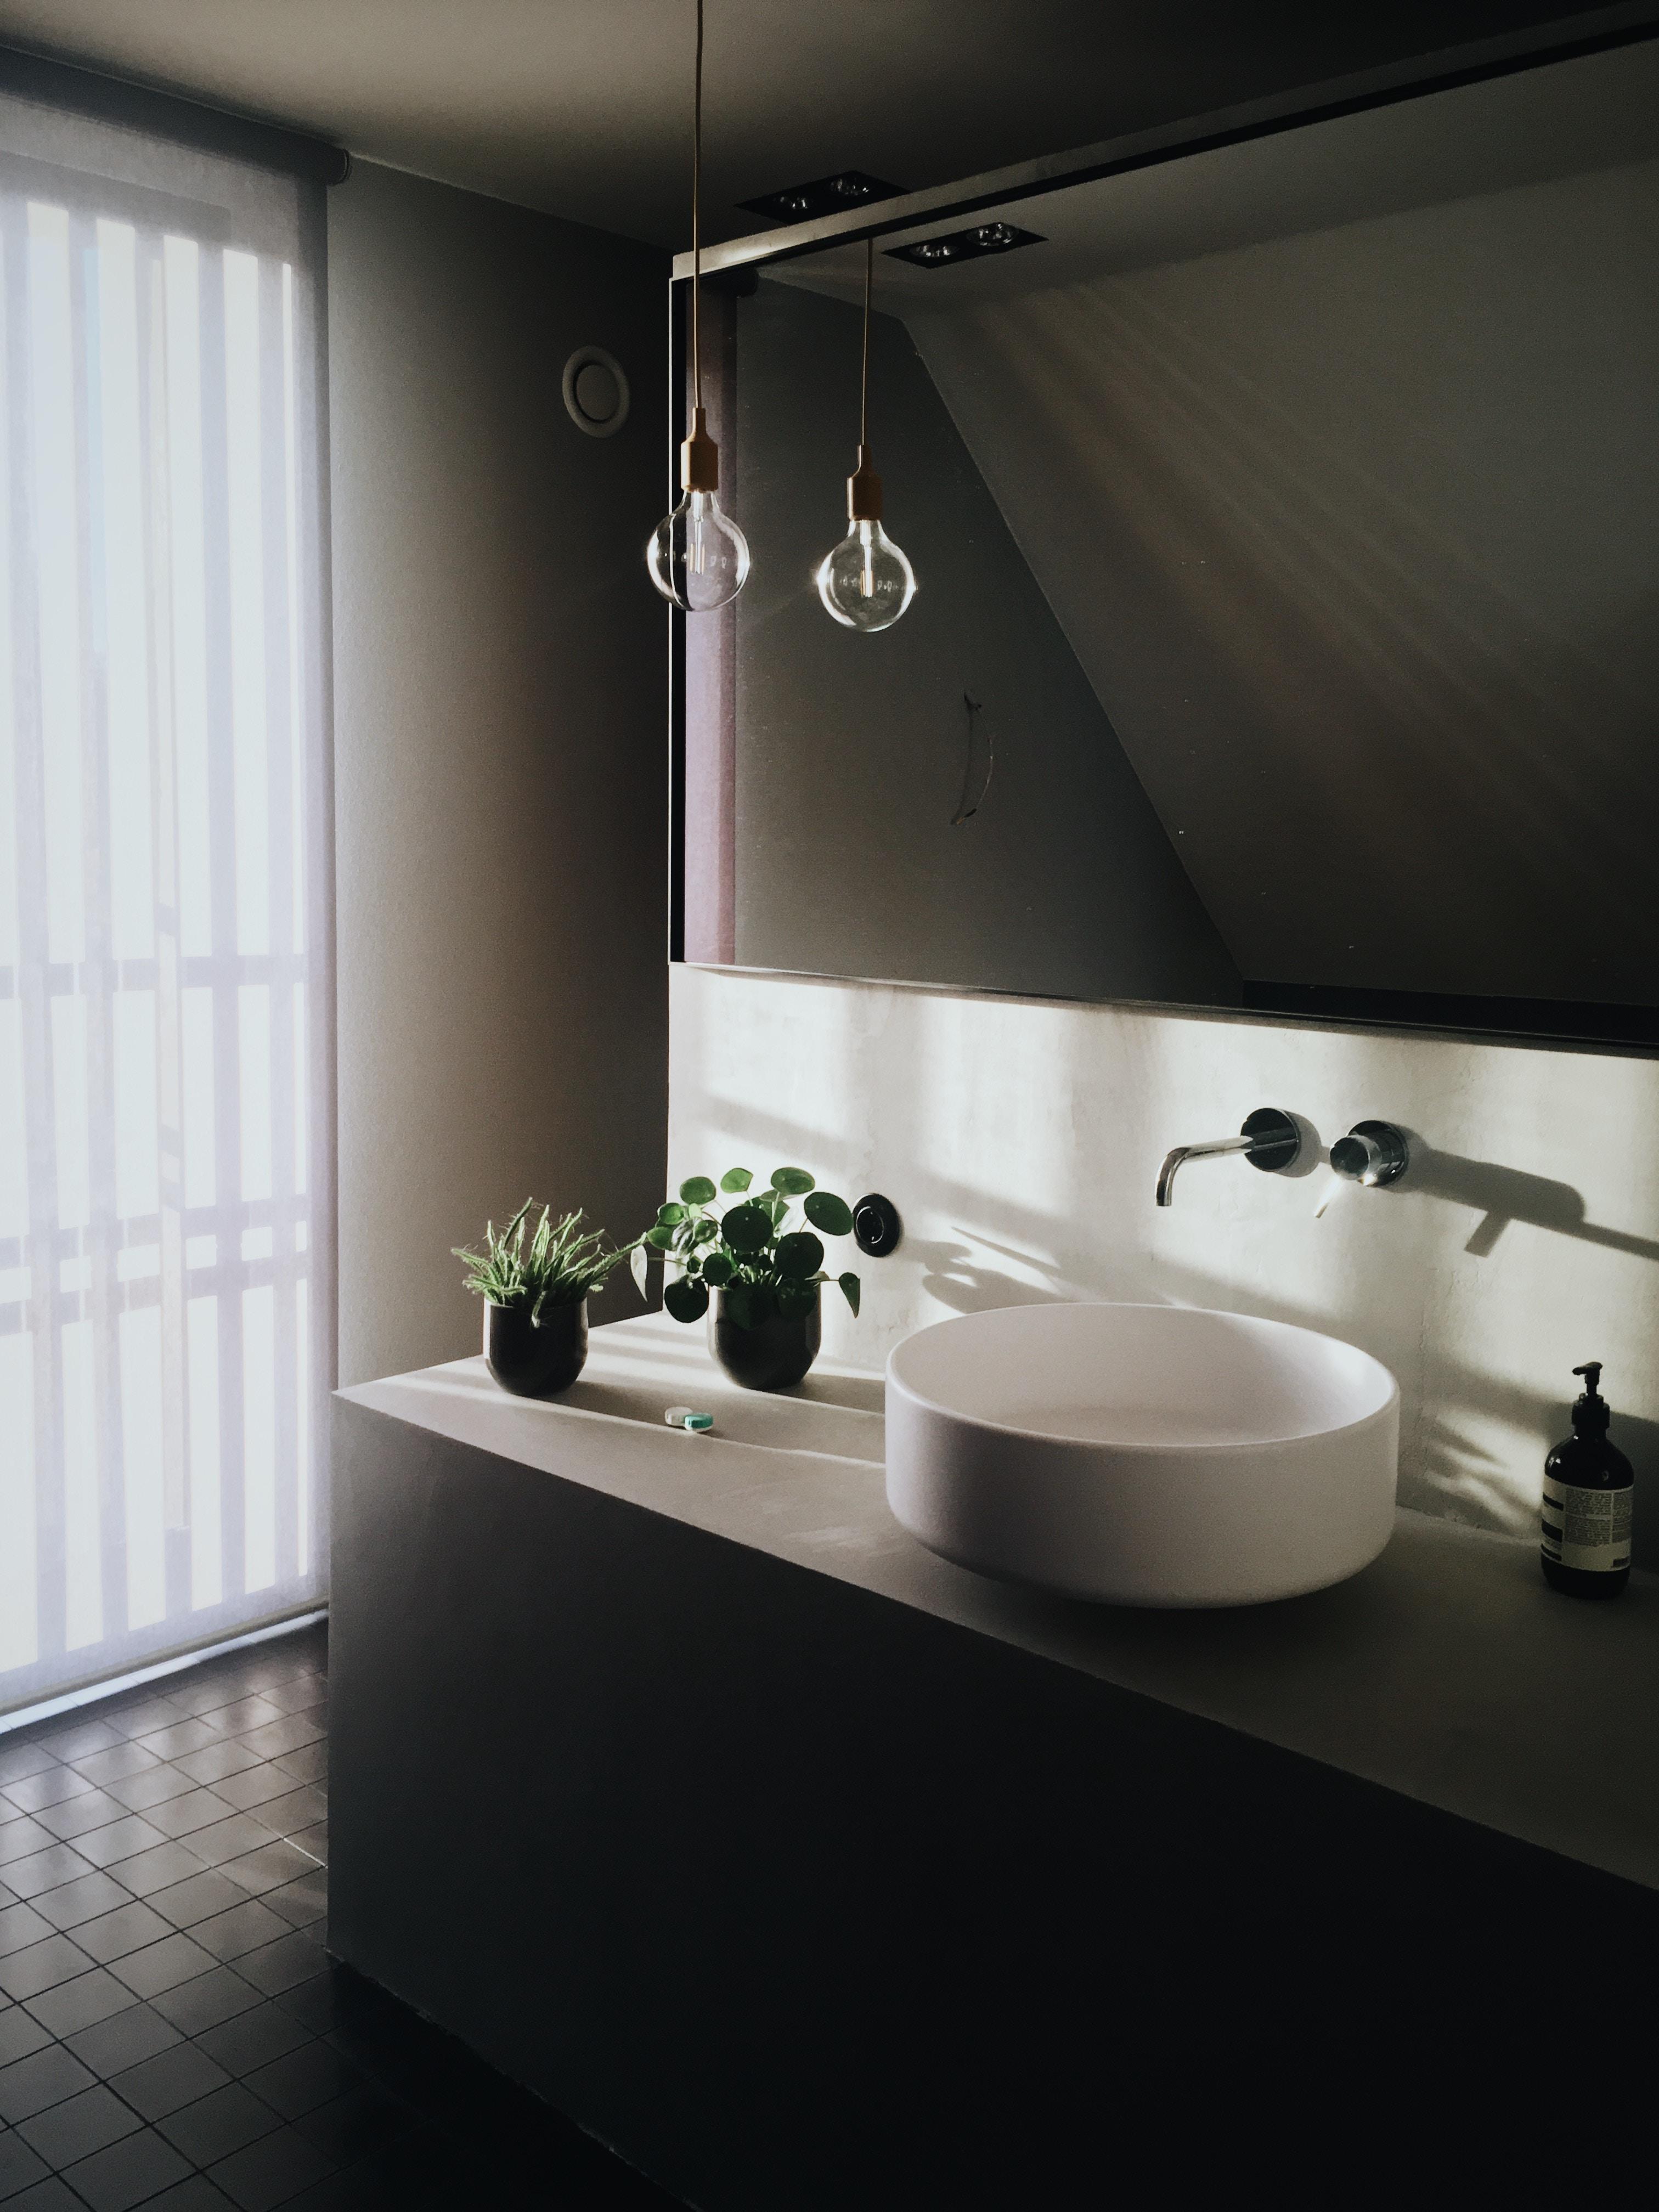 bathroom design 2018 major trends and tips for bathroom design bathroom vanity articles